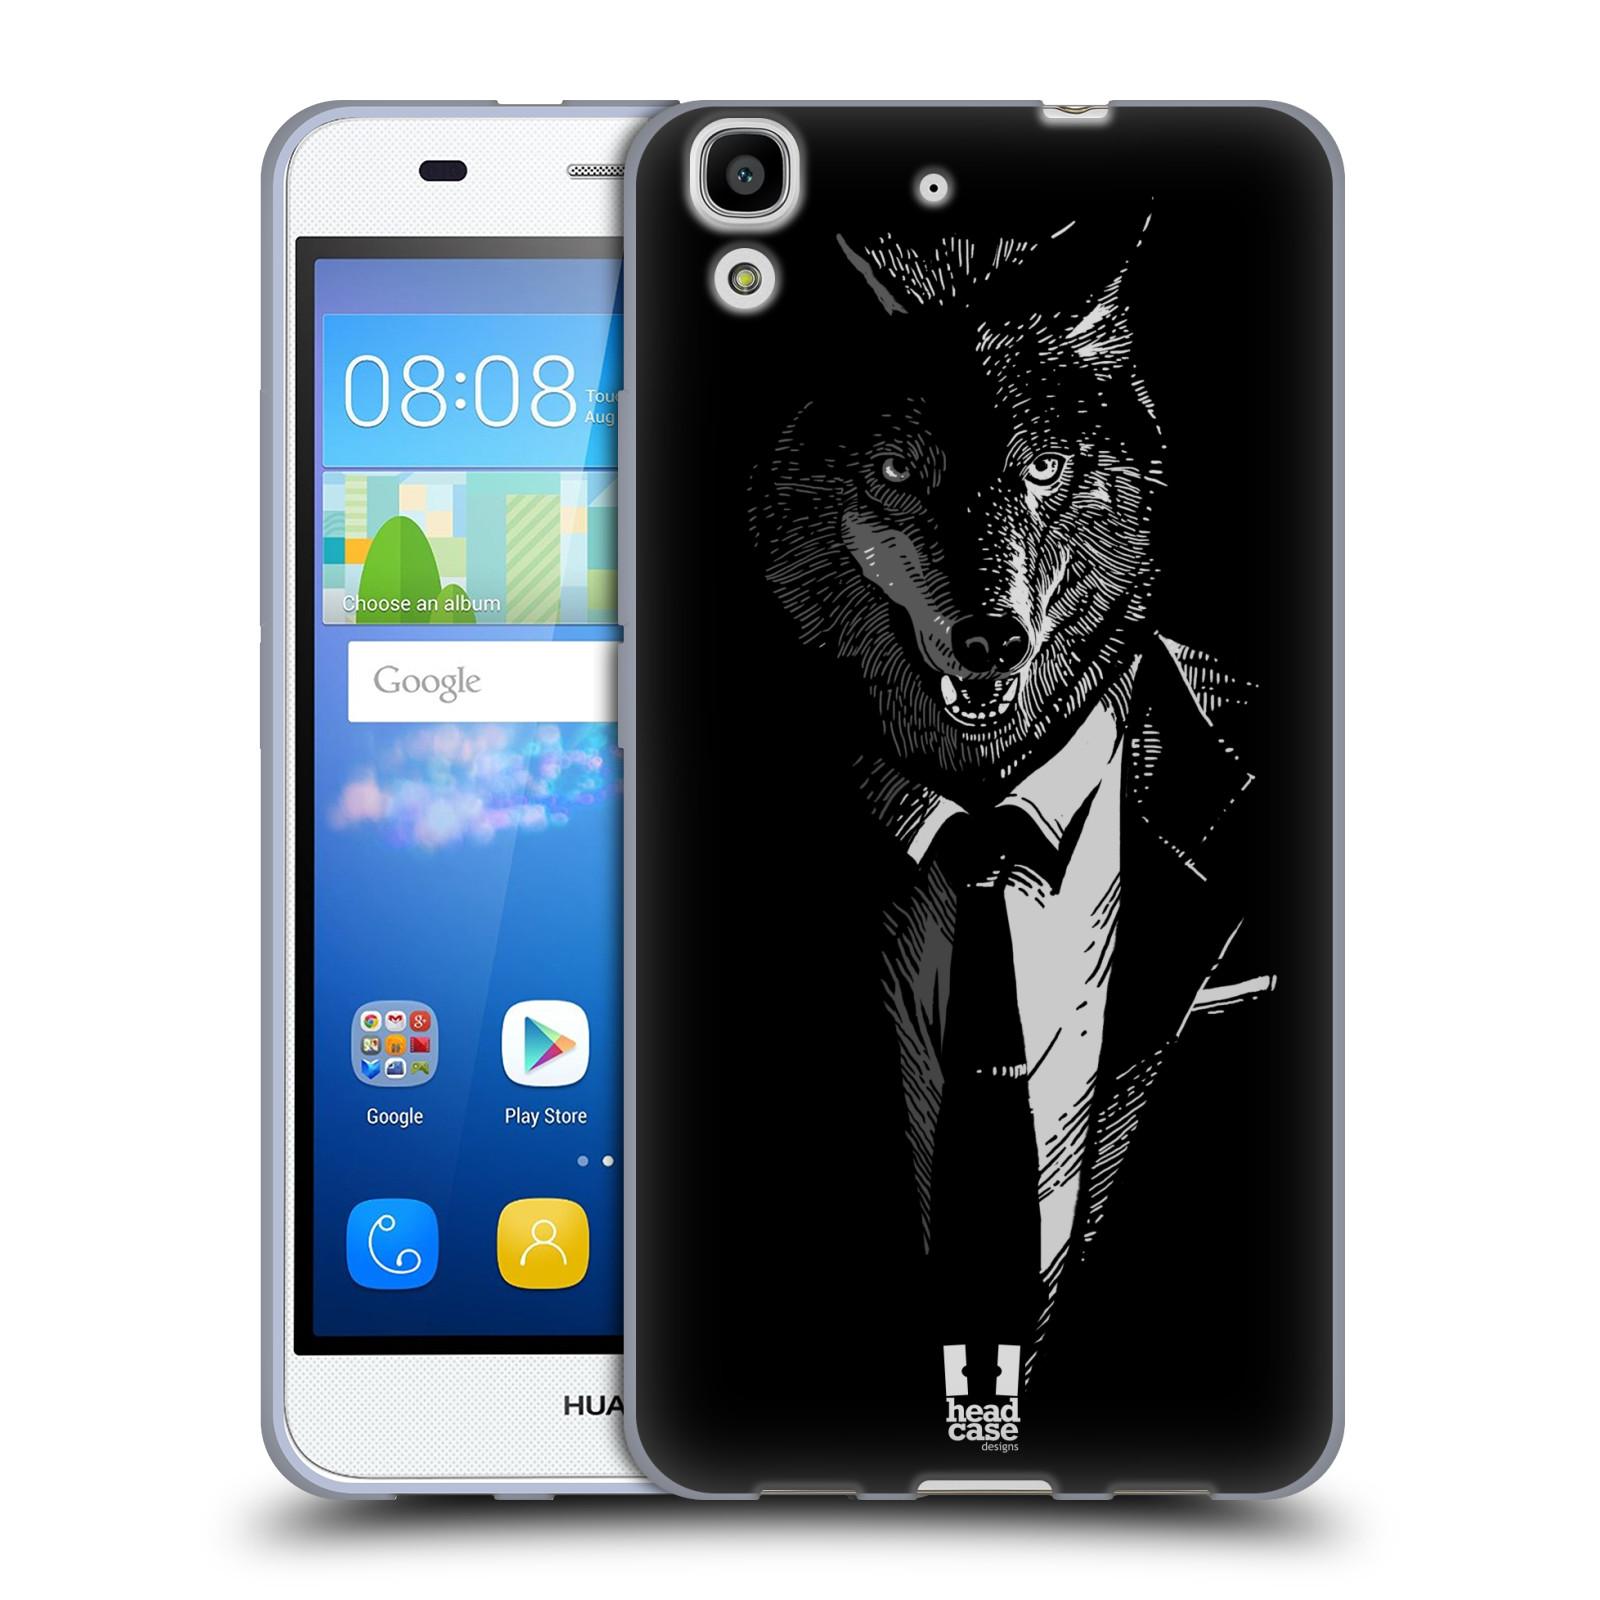 Silikonové pouzdro na mobil Huawei Y6 HEAD CASE VLK V KVÁDRU